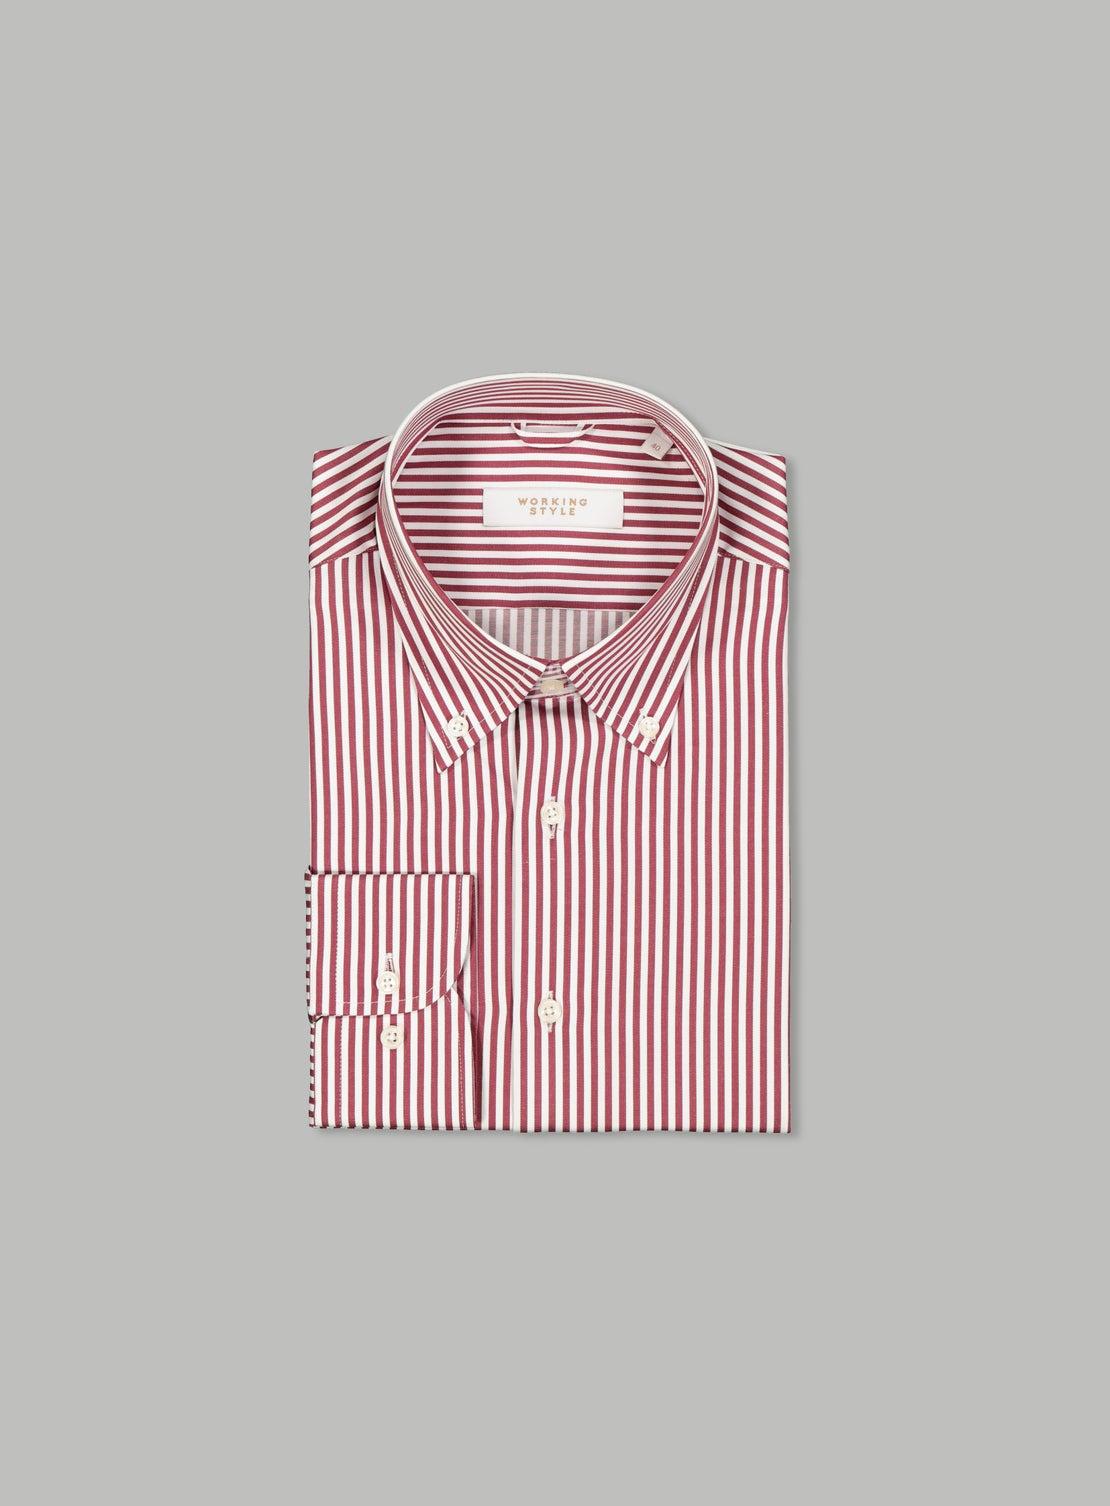 Francis Burgundy Essential Shirt